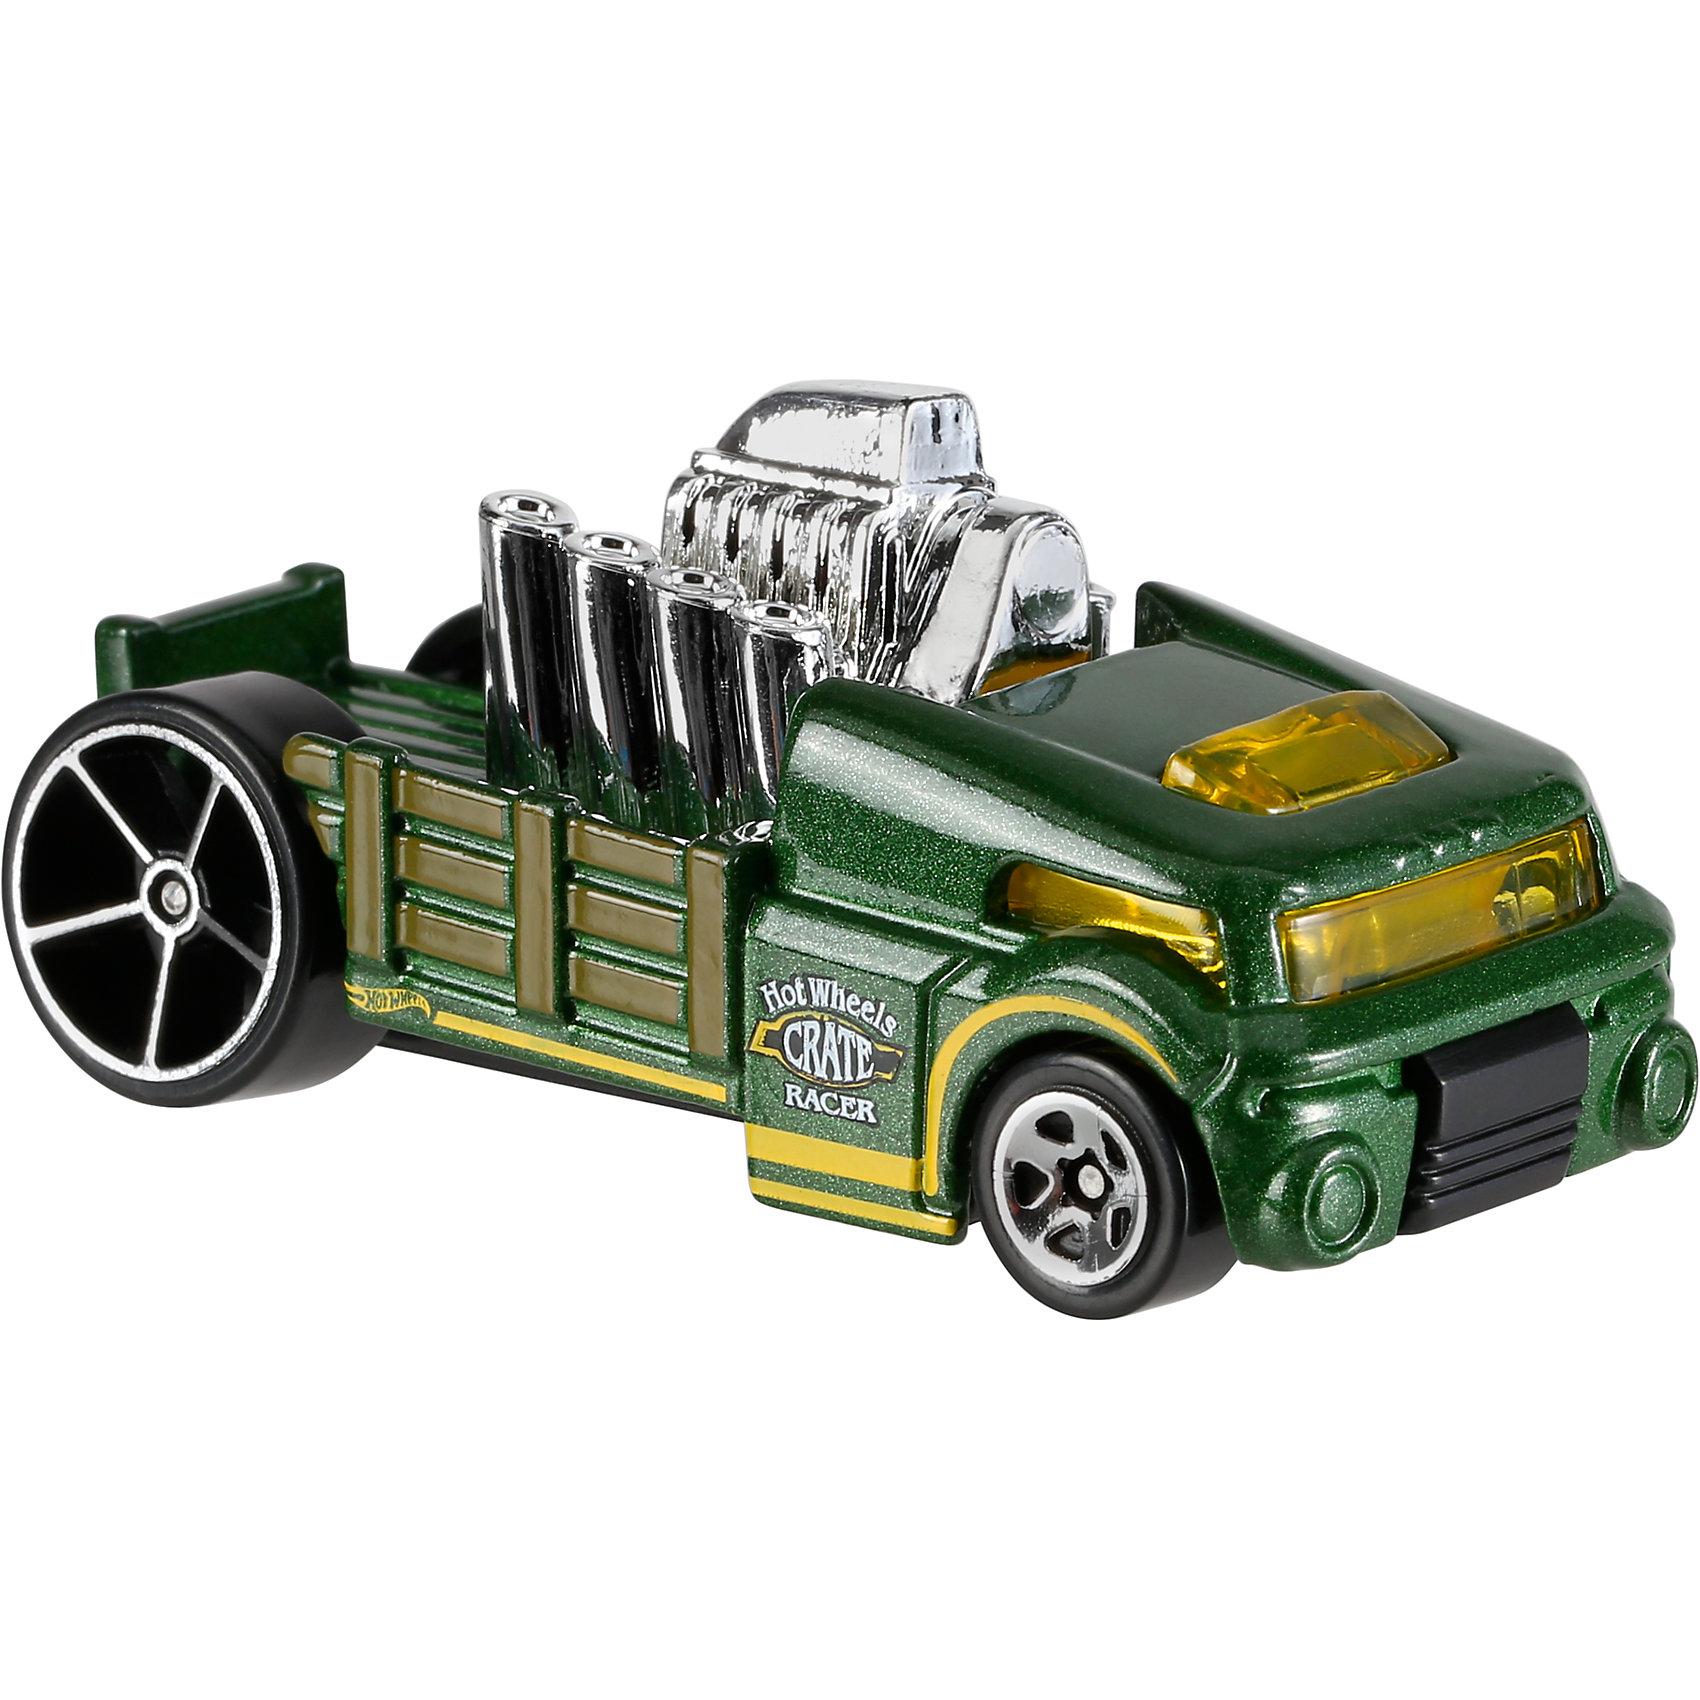 Базовая машинка Hot Wheels, Crate RacerПопулярные игрушки<br><br><br>Ширина мм: 110<br>Глубина мм: 45<br>Высота мм: 110<br>Вес г: 30<br>Возраст от месяцев: 36<br>Возраст до месяцев: 96<br>Пол: Мужской<br>Возраст: Детский<br>SKU: 7142068